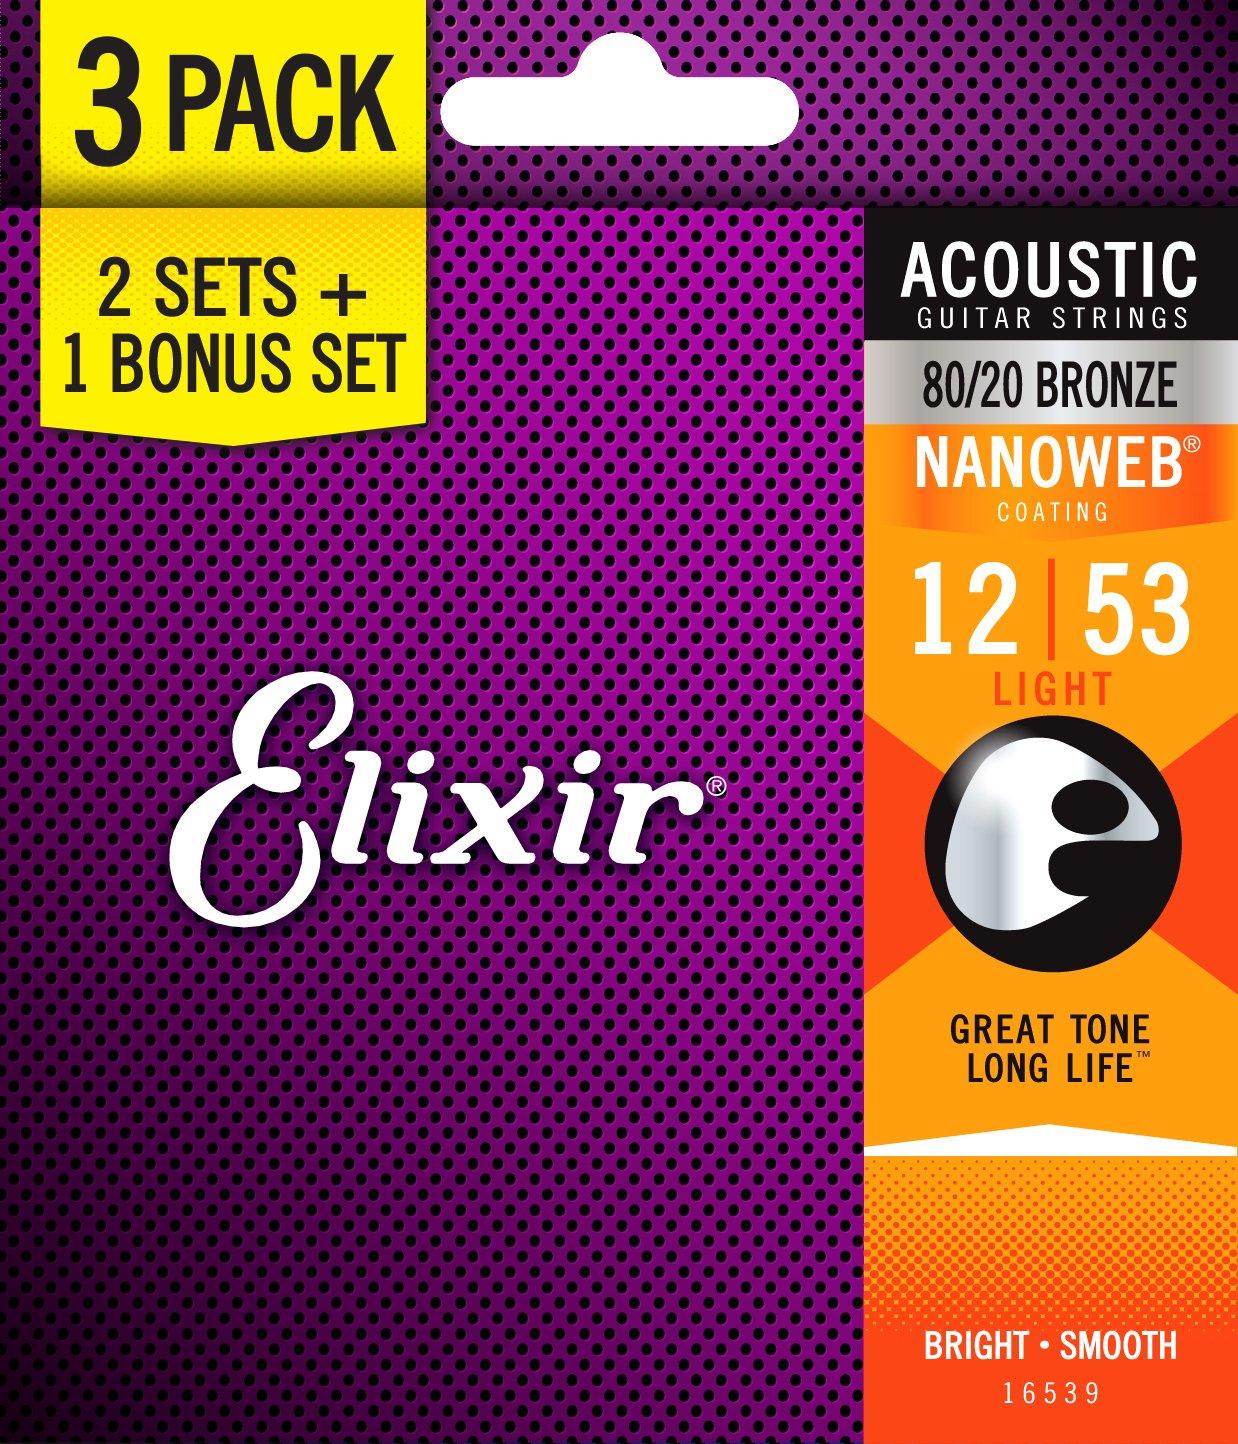 Elixir Strings 16539 Light 80/20 Bronze Nanoweb Acoustic Guitar Strings 3-Pack (.012.053)